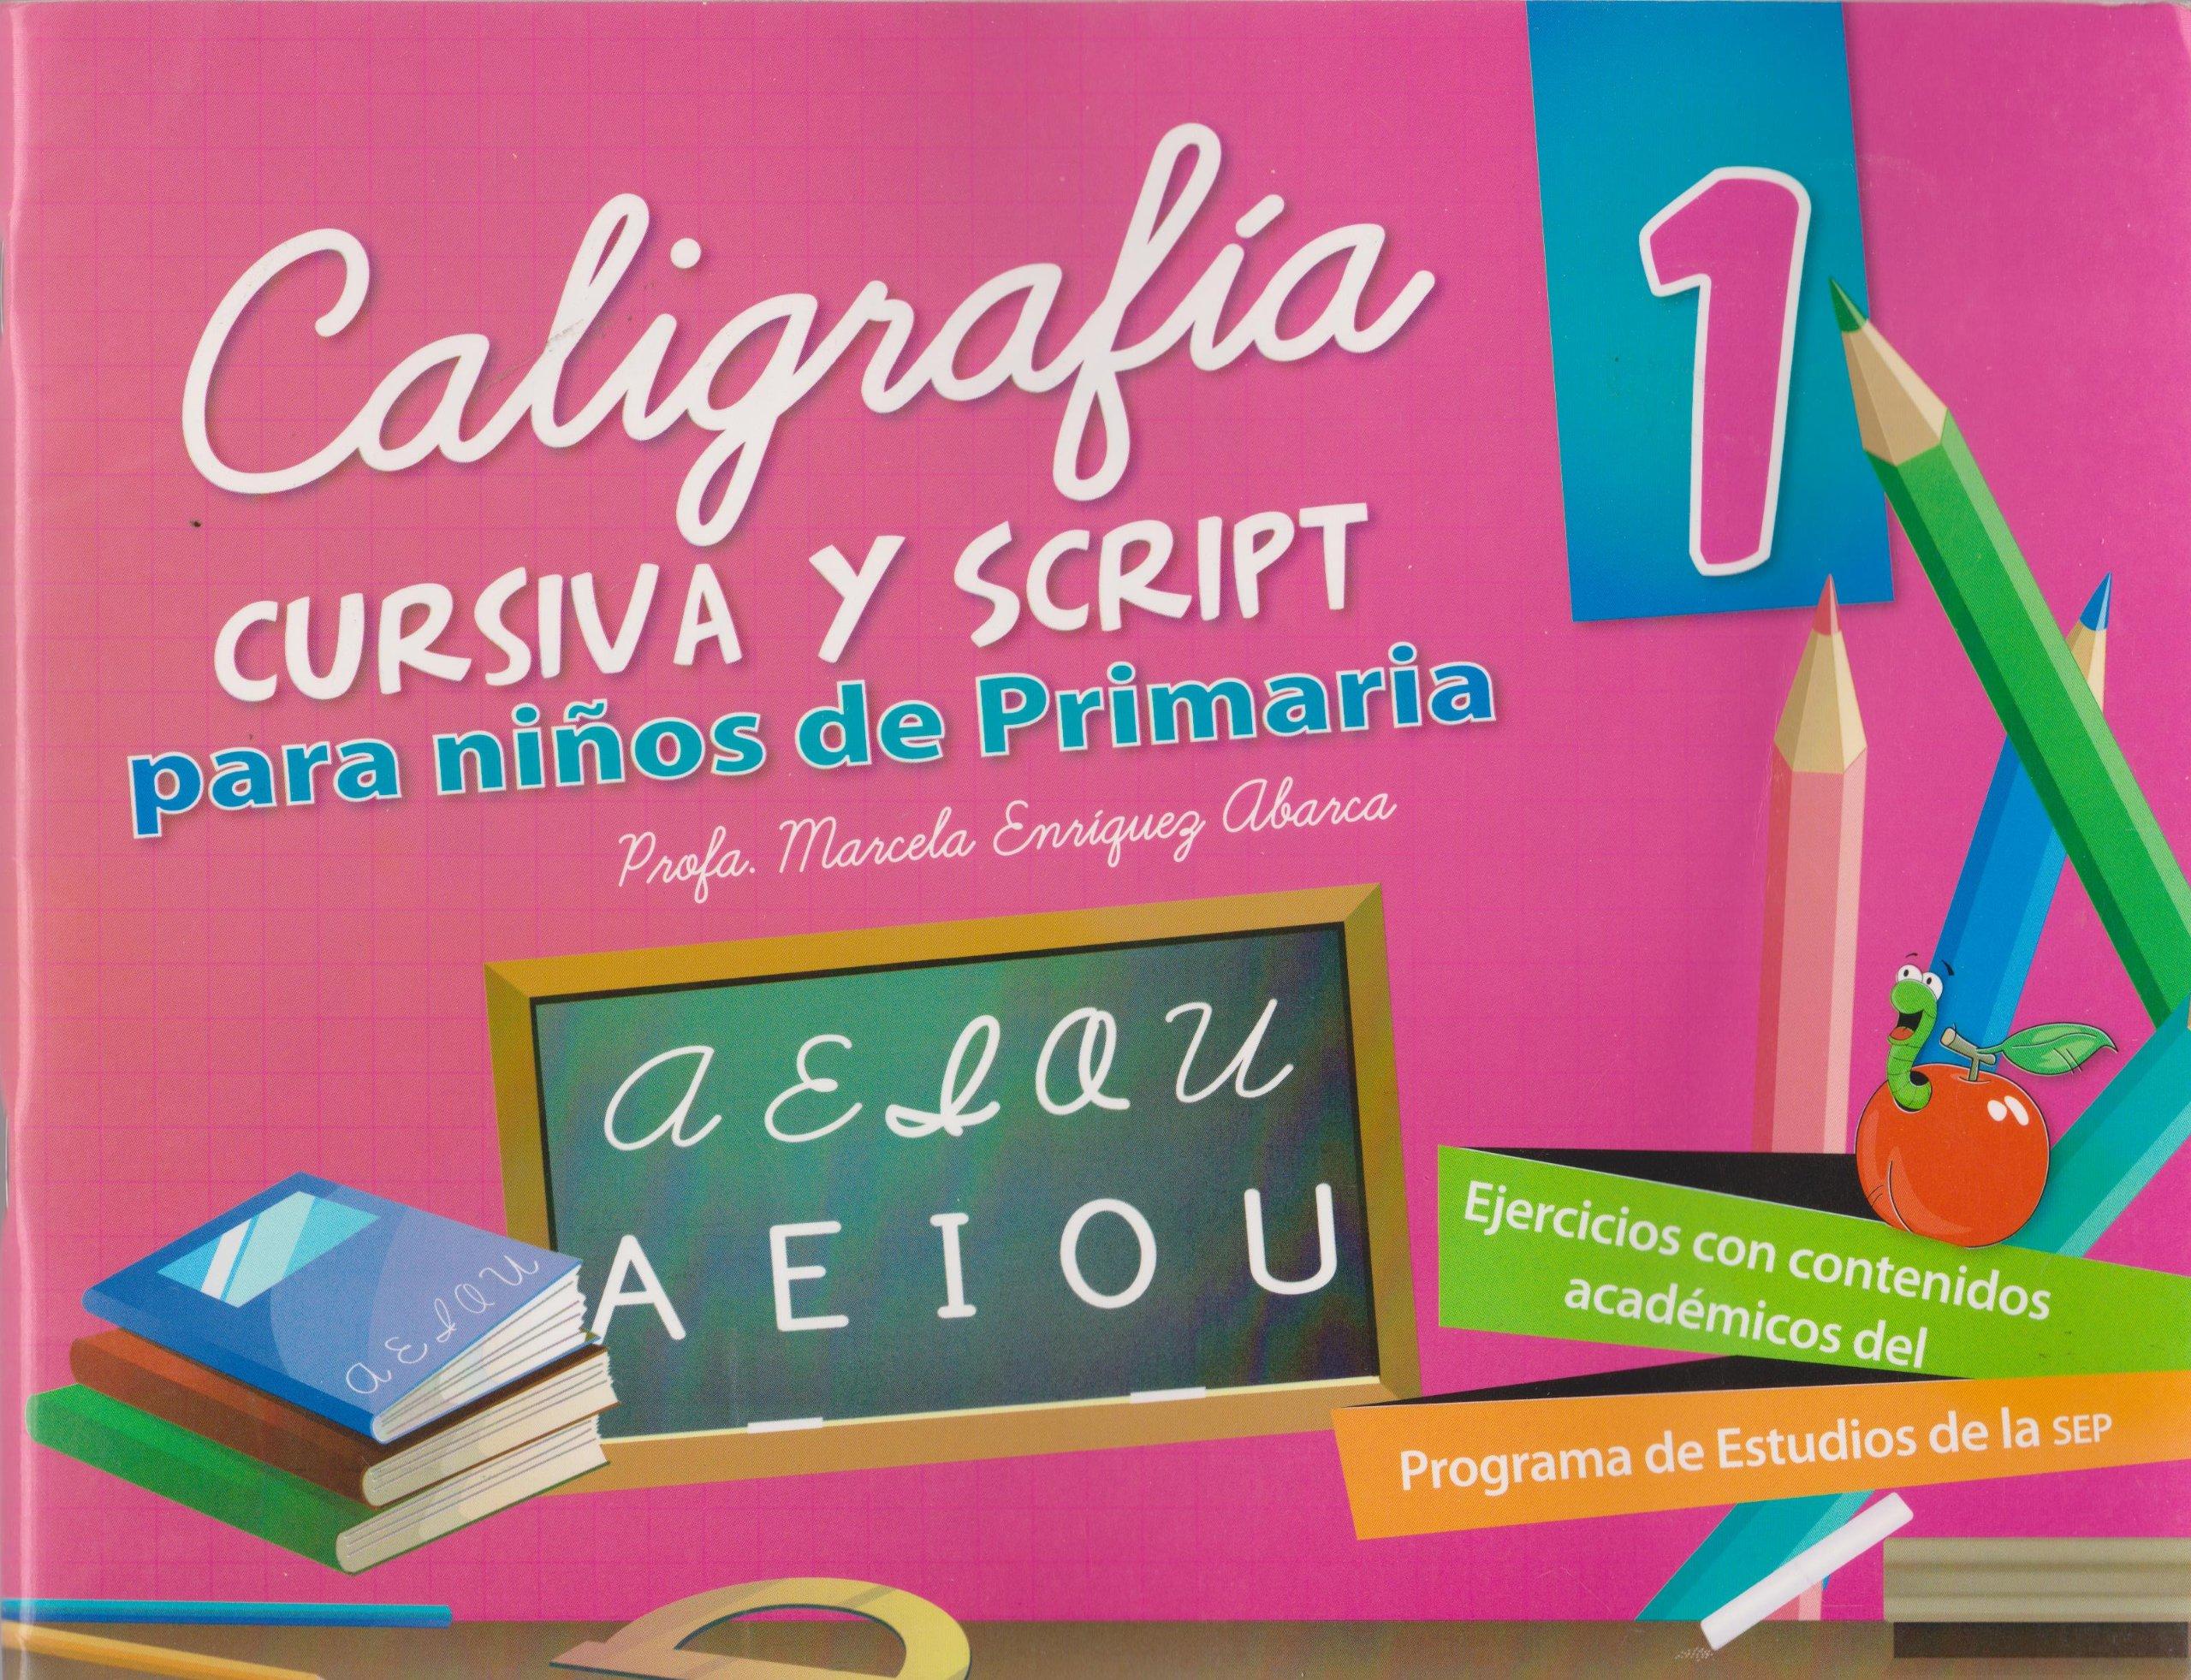 Caligrafia cursiva y script 1 para ninos de primaria (Spanish Edition): Marcela Profa. Enriquez Abarca: 9786071408211: Amazon.com: Books